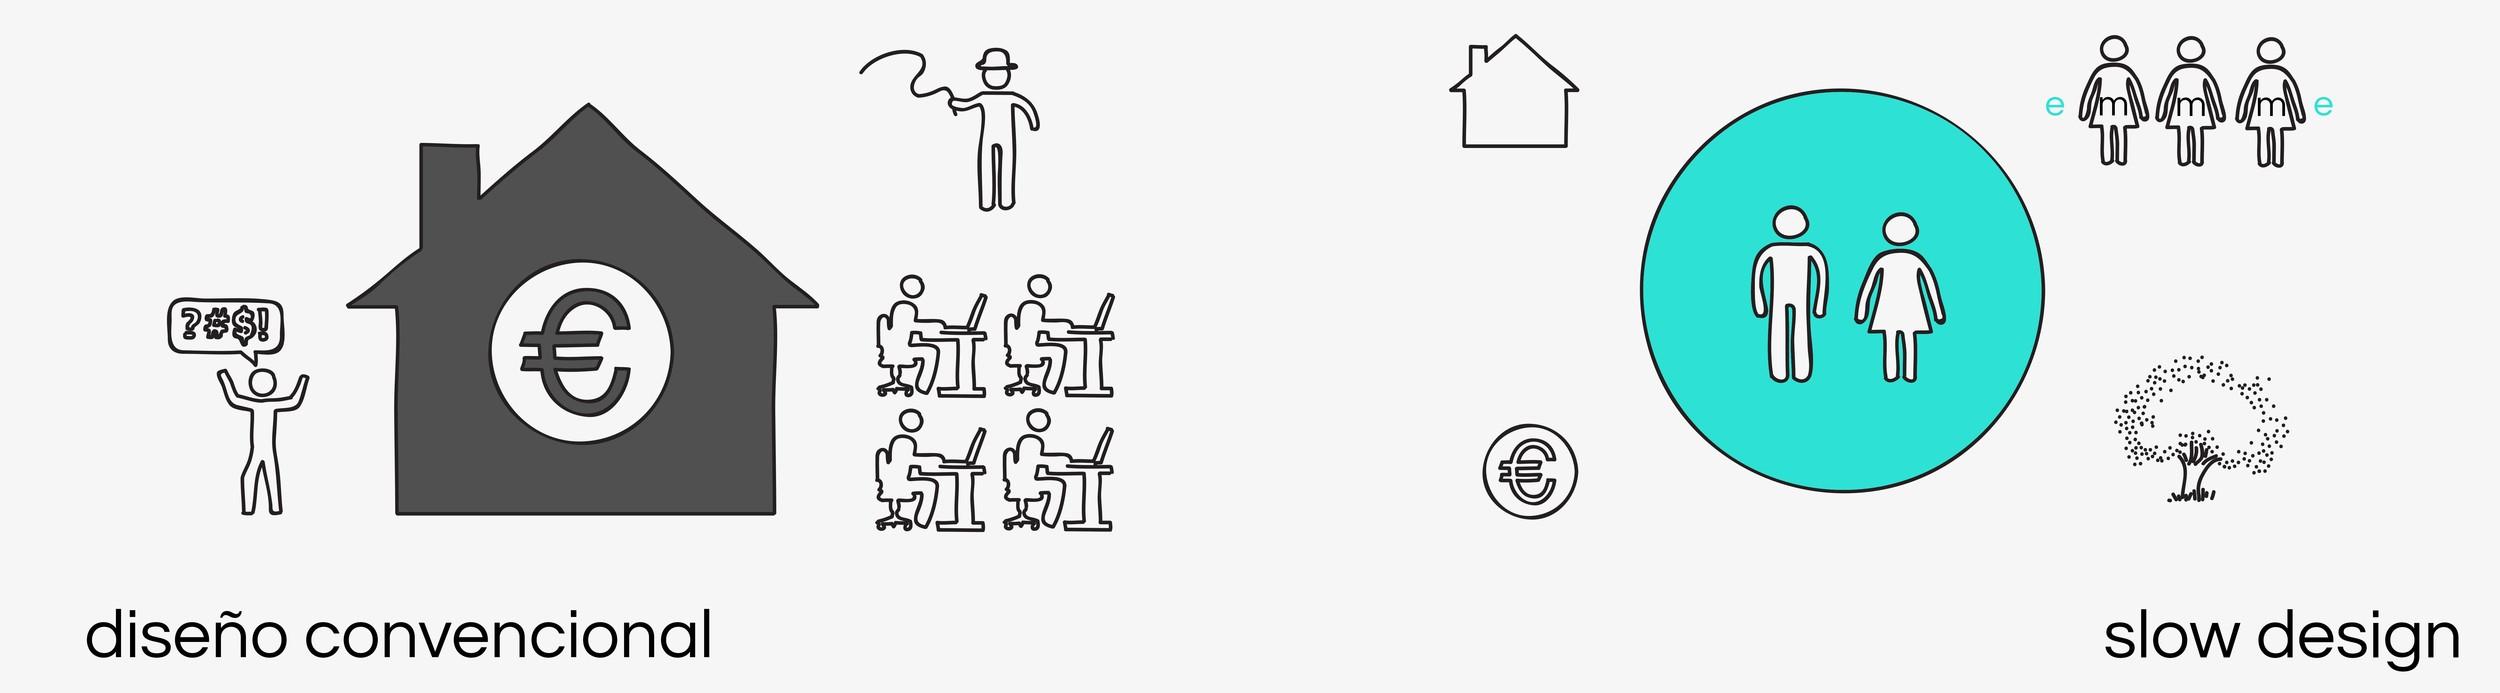 emmme-filosofía-slowdesign-01diseñoentornoalapersona.jpg